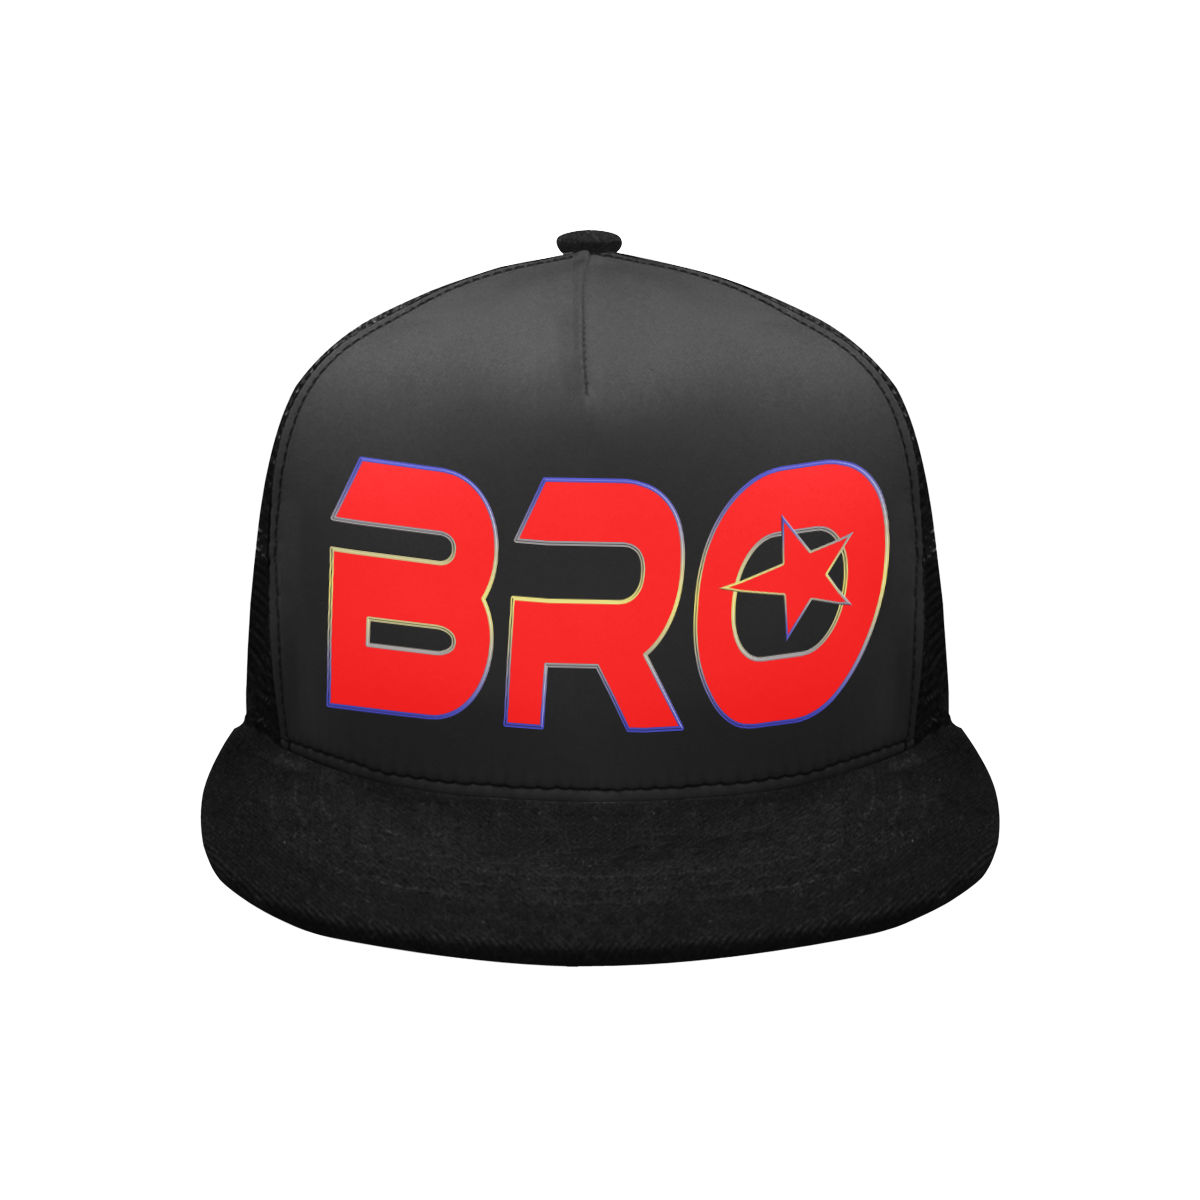 BRO RED BASECAP Trucker Hat H (Front Panel Customization)